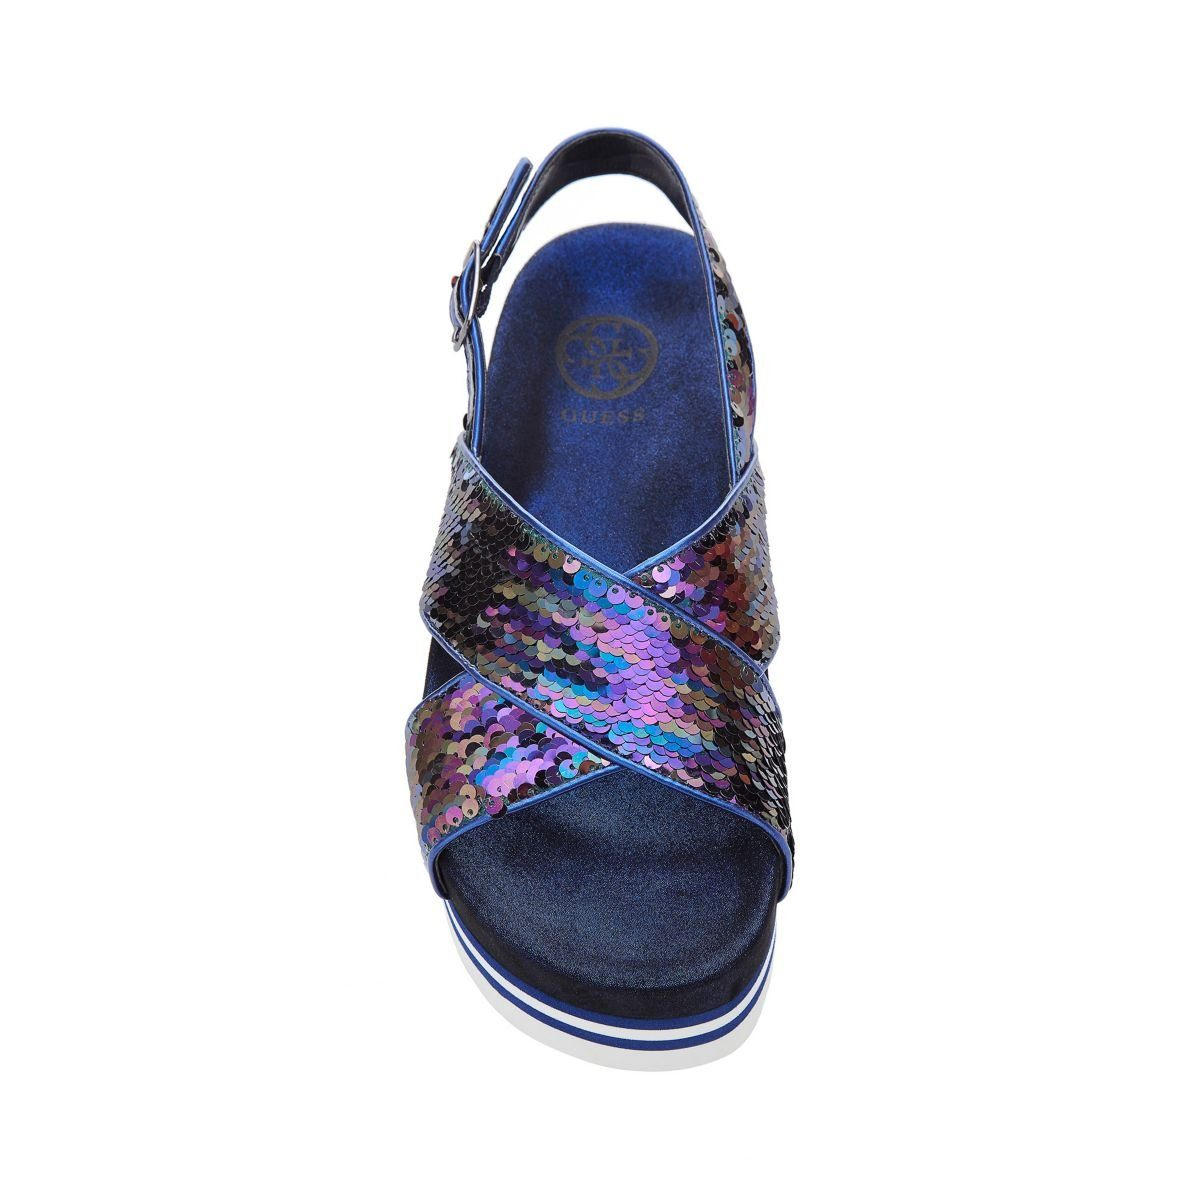 Guess Sandale online kaufen  blau